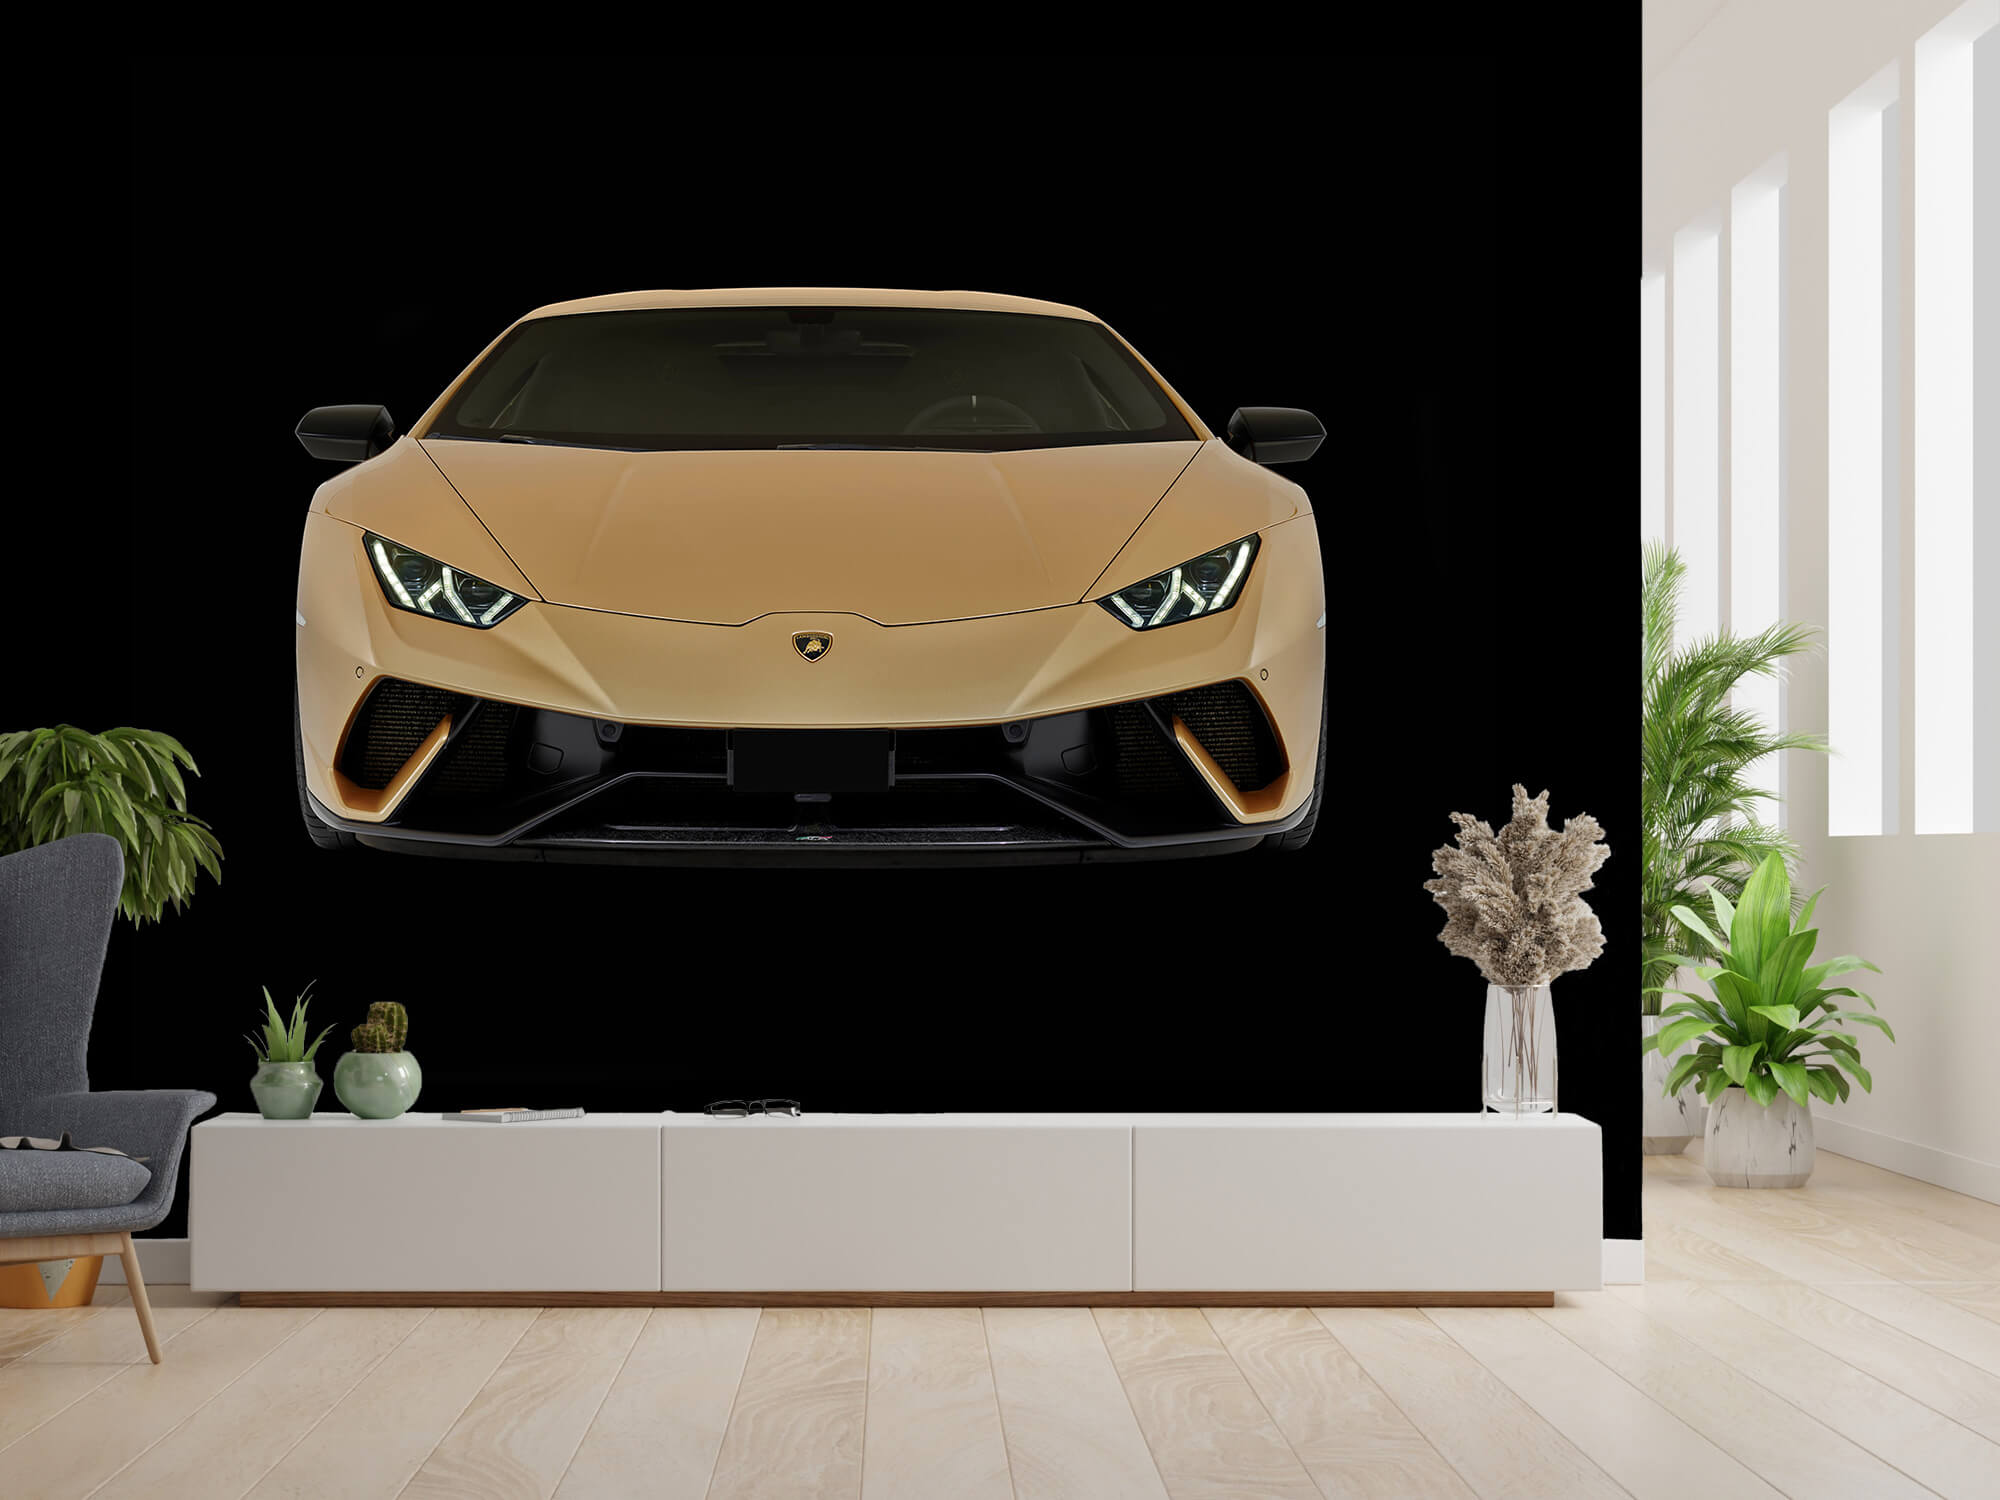 Wallpaper Lamborghini Huracán - Voorkant, zwart 2